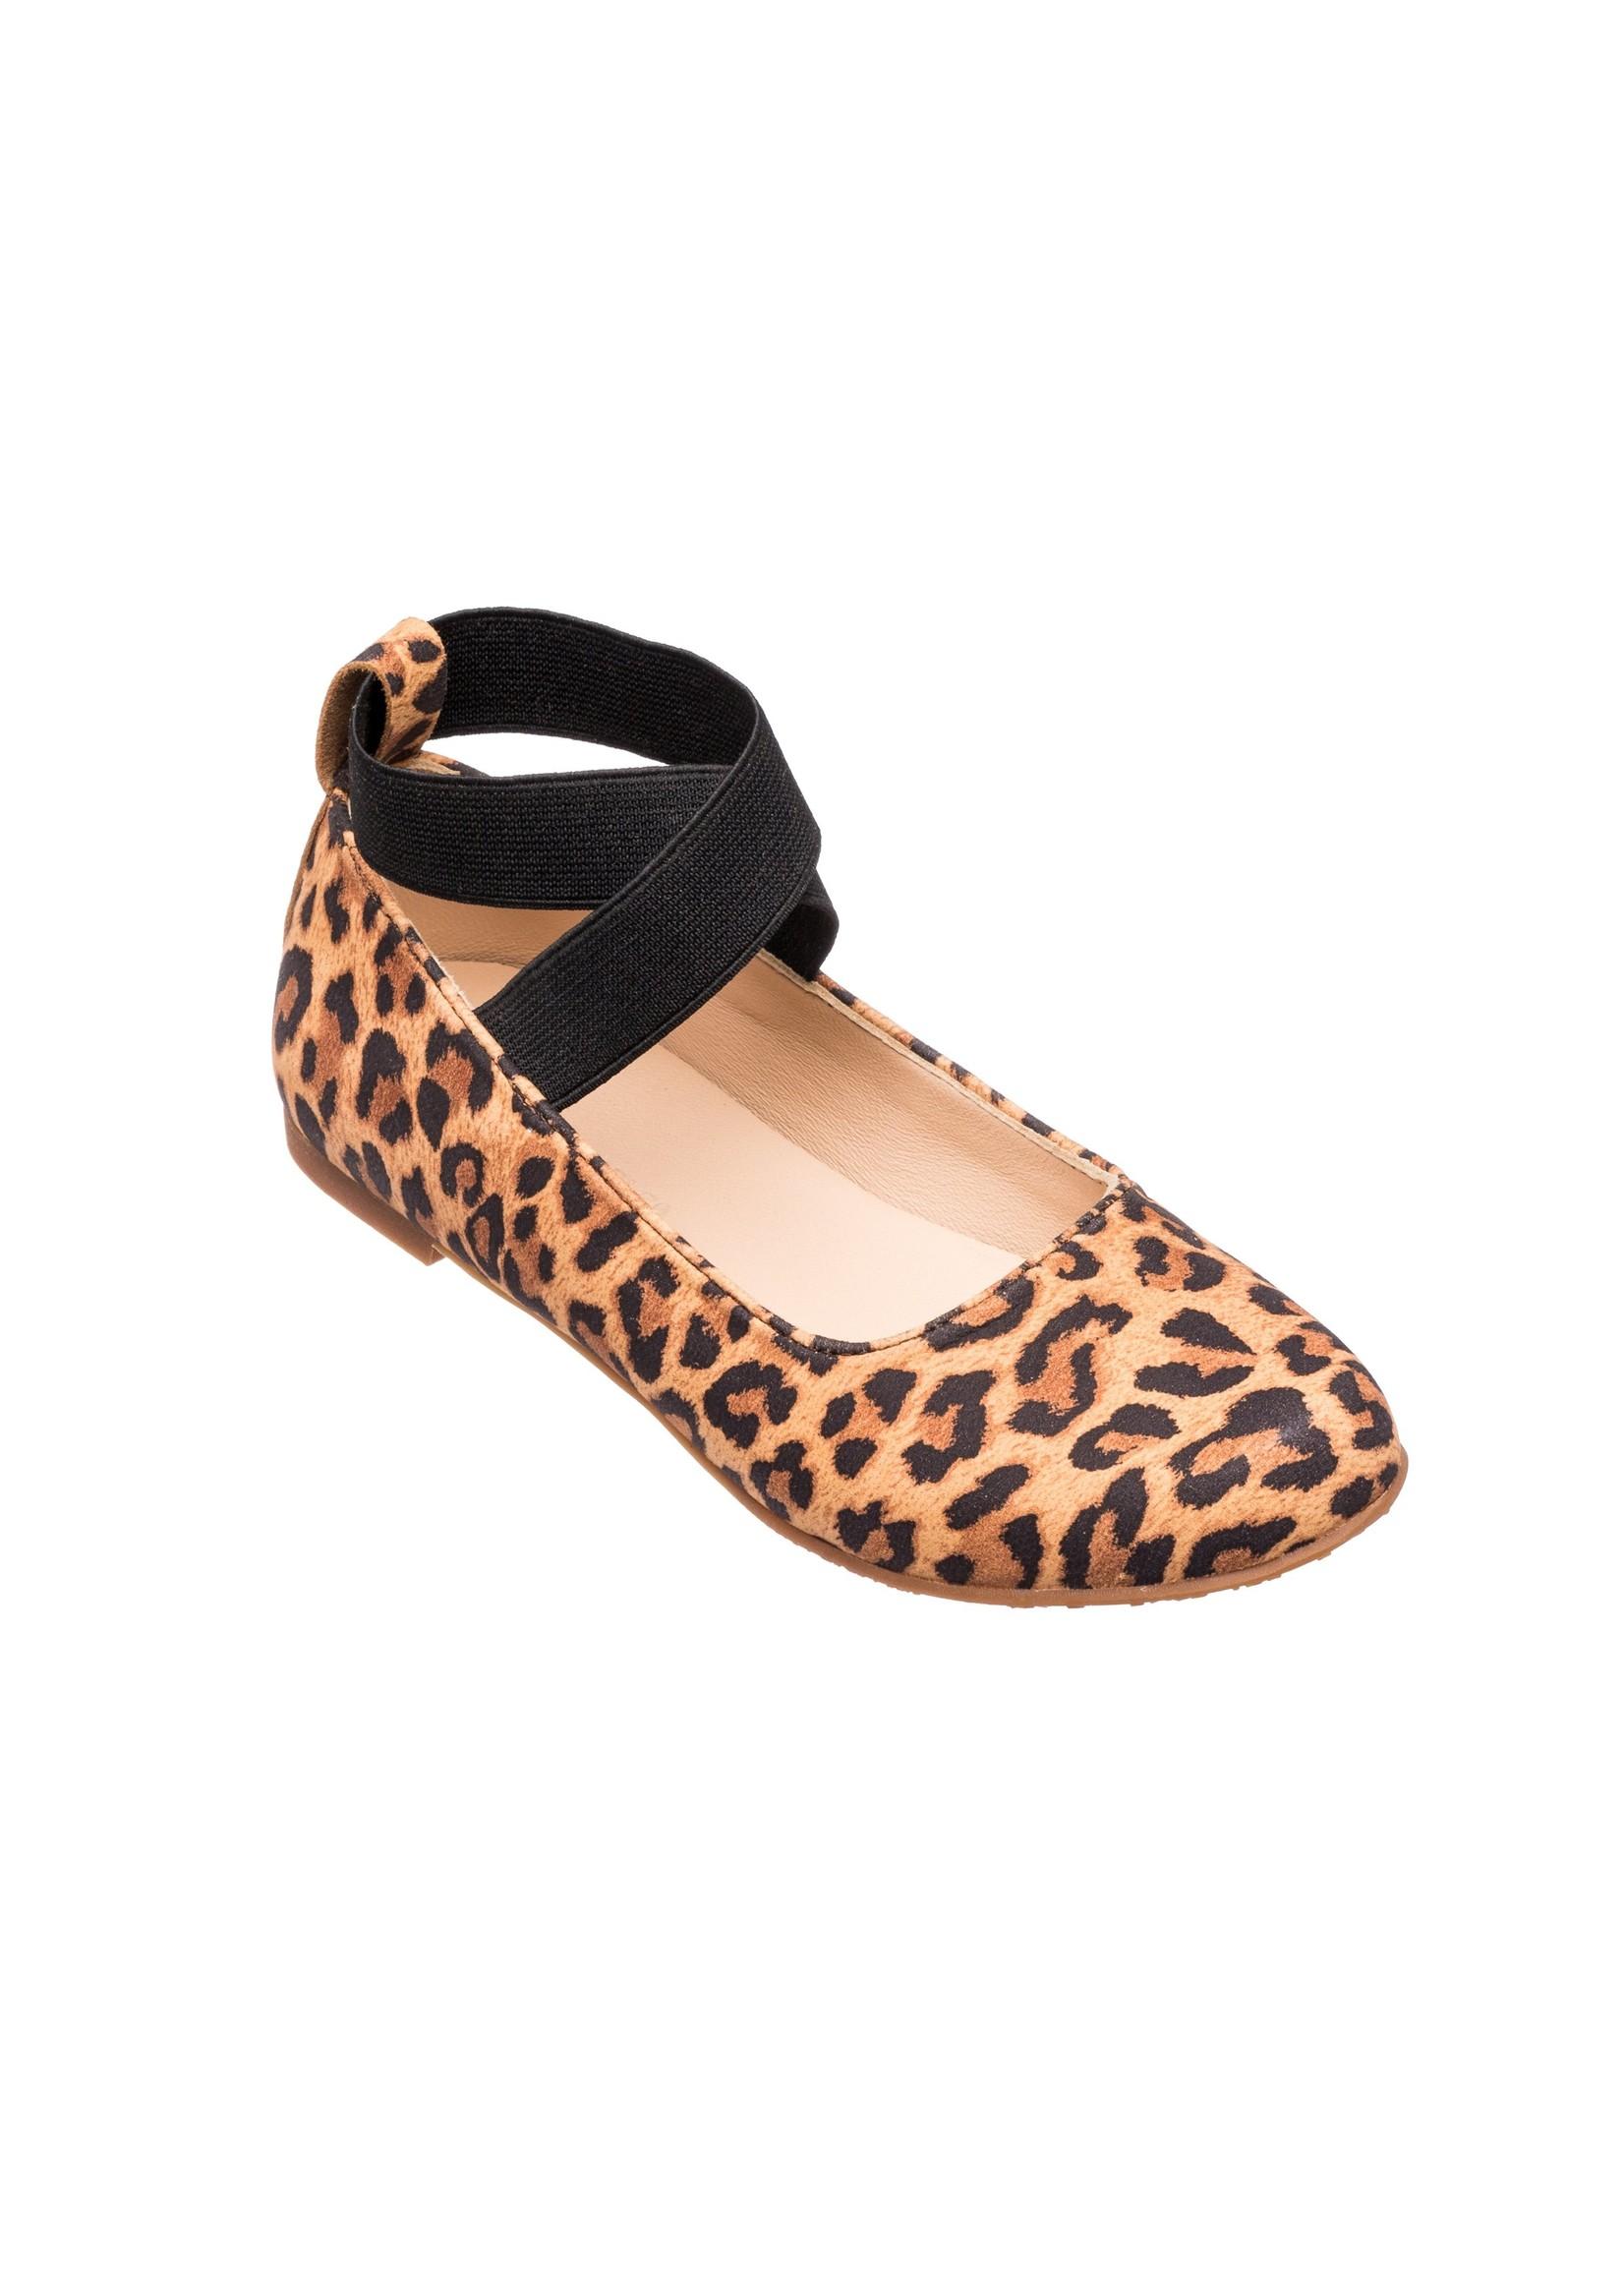 Elephantito Melissa Flat Suede Leopard